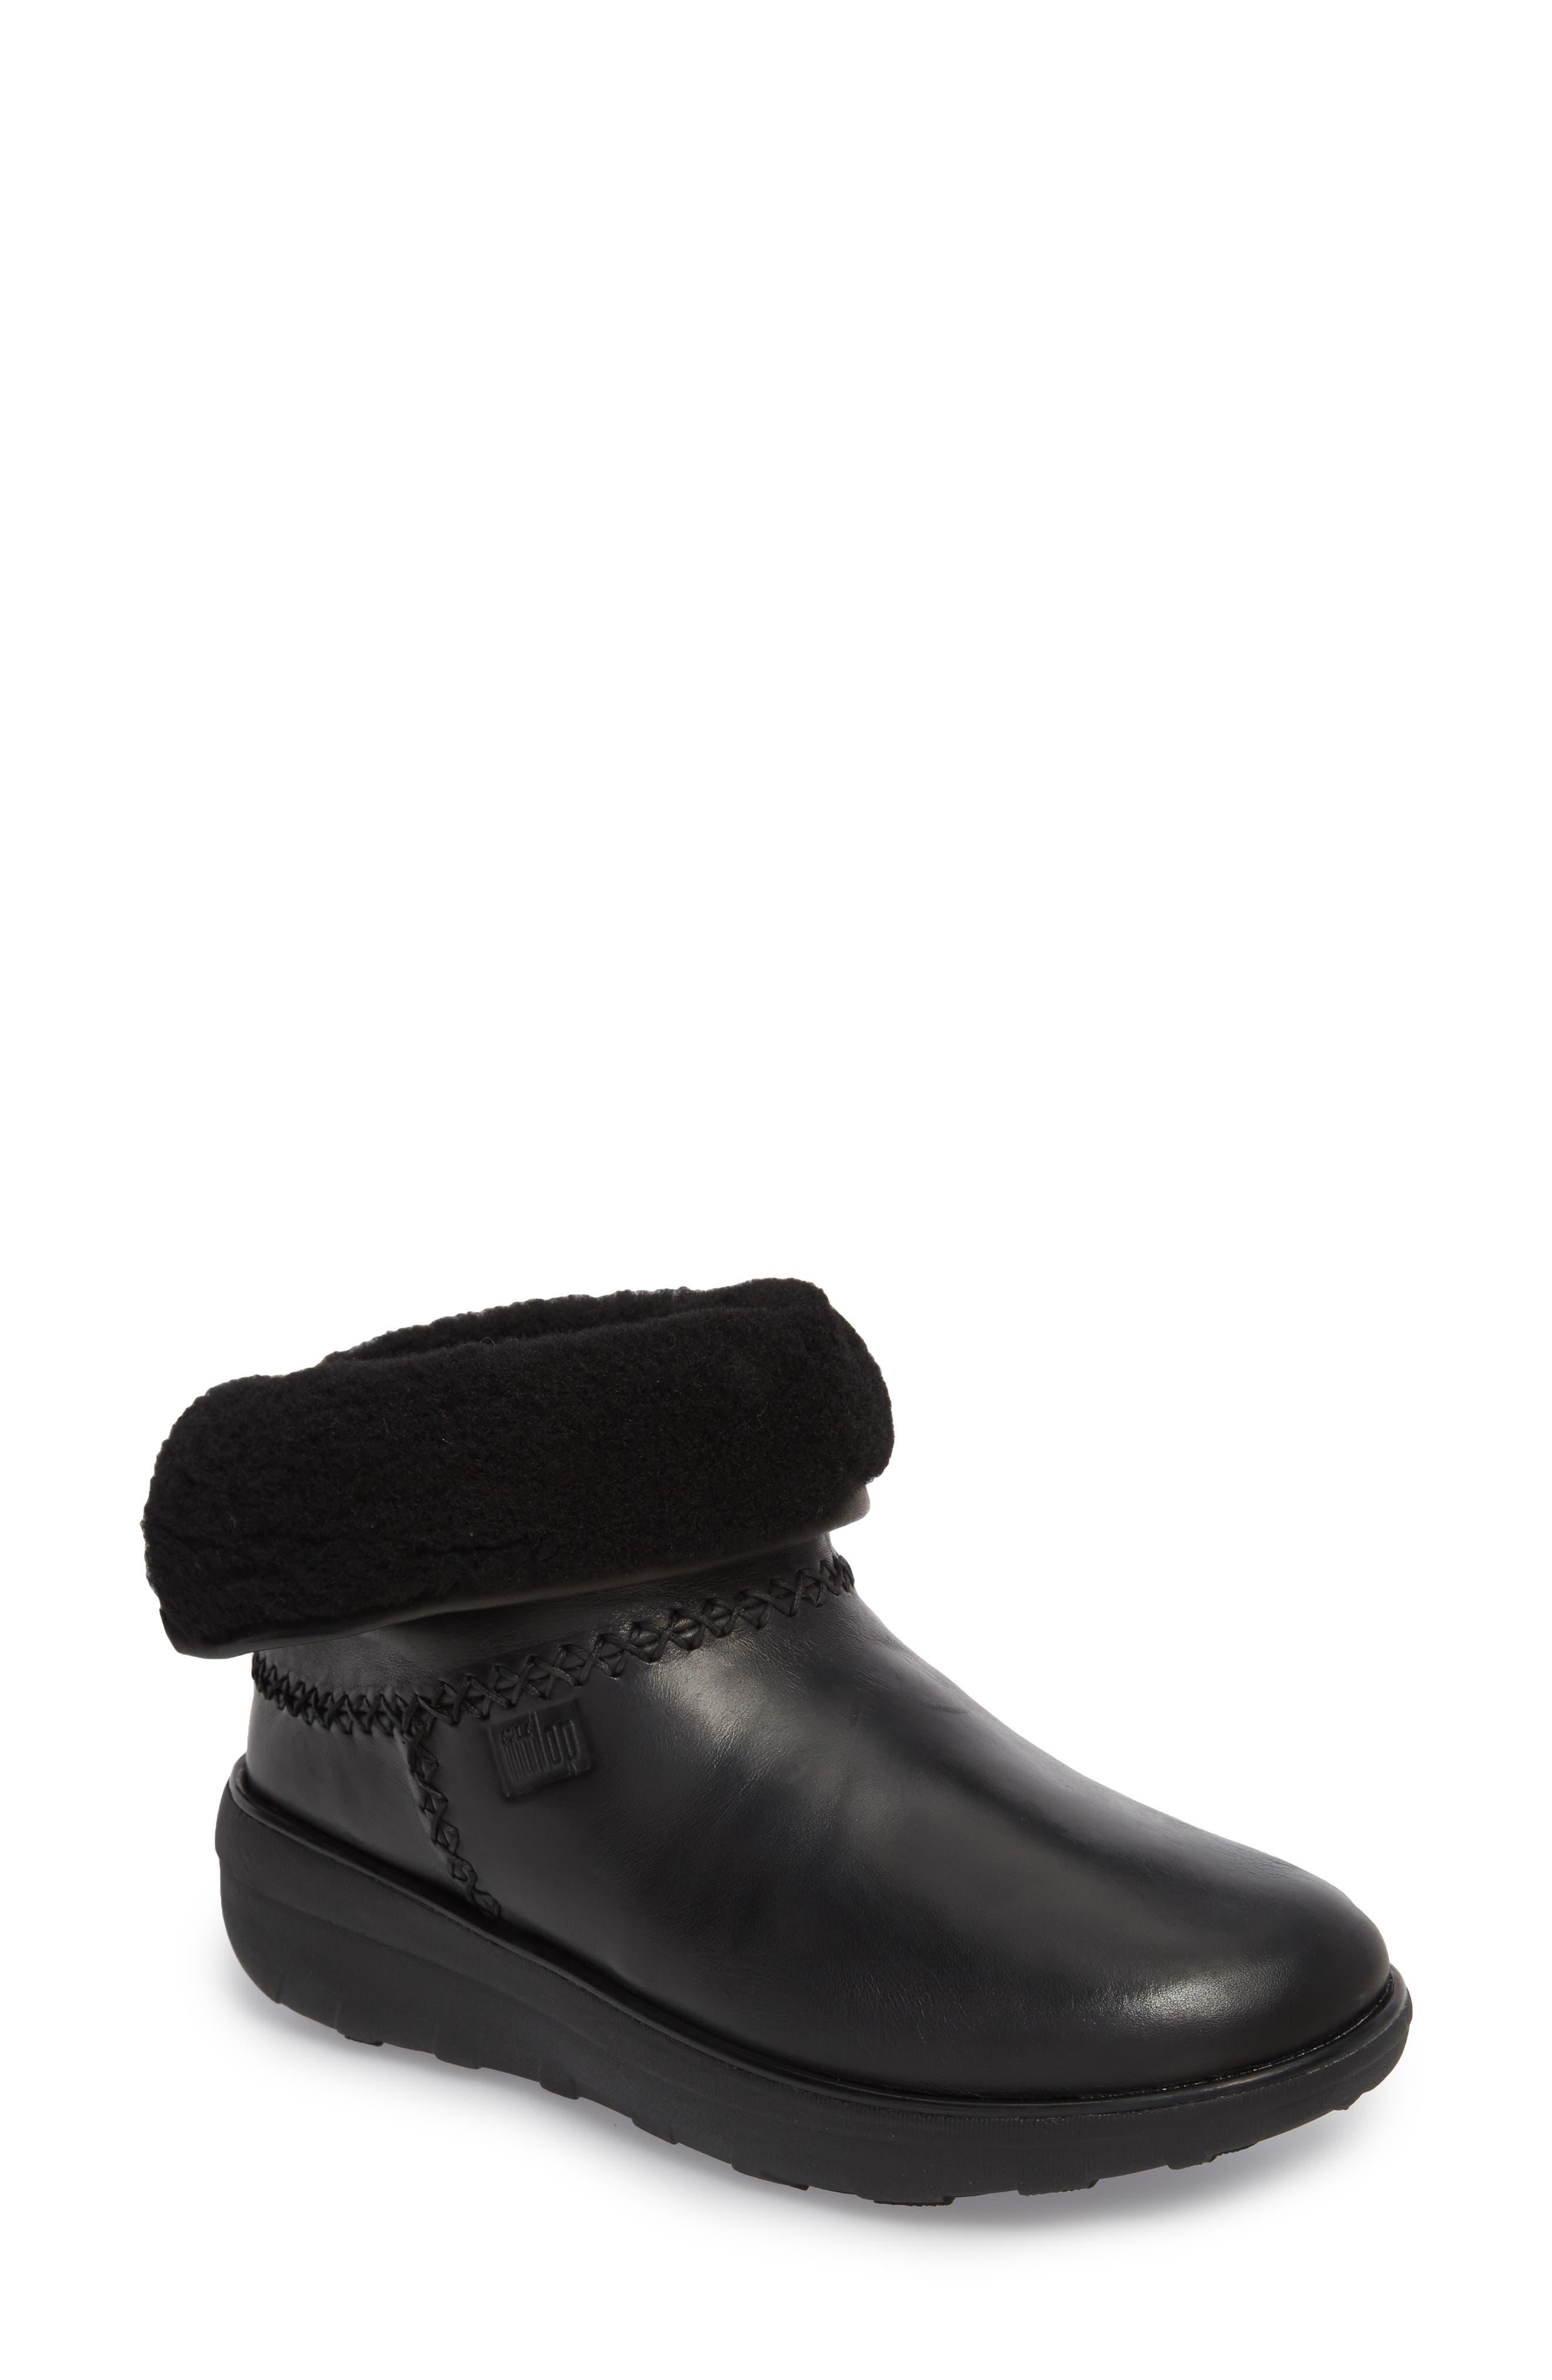 Mukluk Shorty II Boot,                         Main,                         color, 001